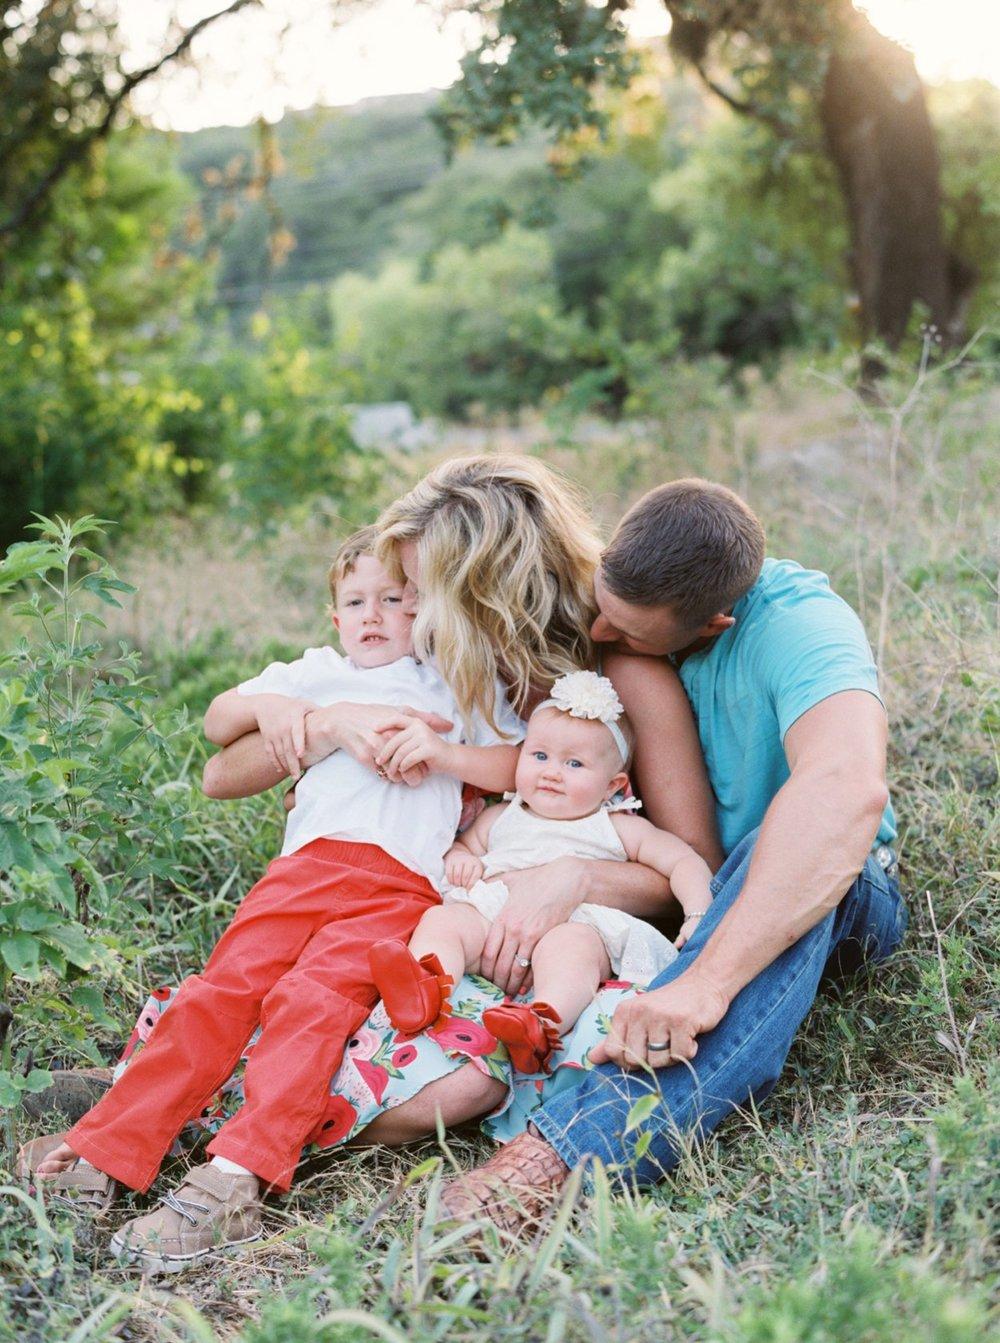 8f7a1-austinfamilyphotographeraustinfamilyphotographer.jpg